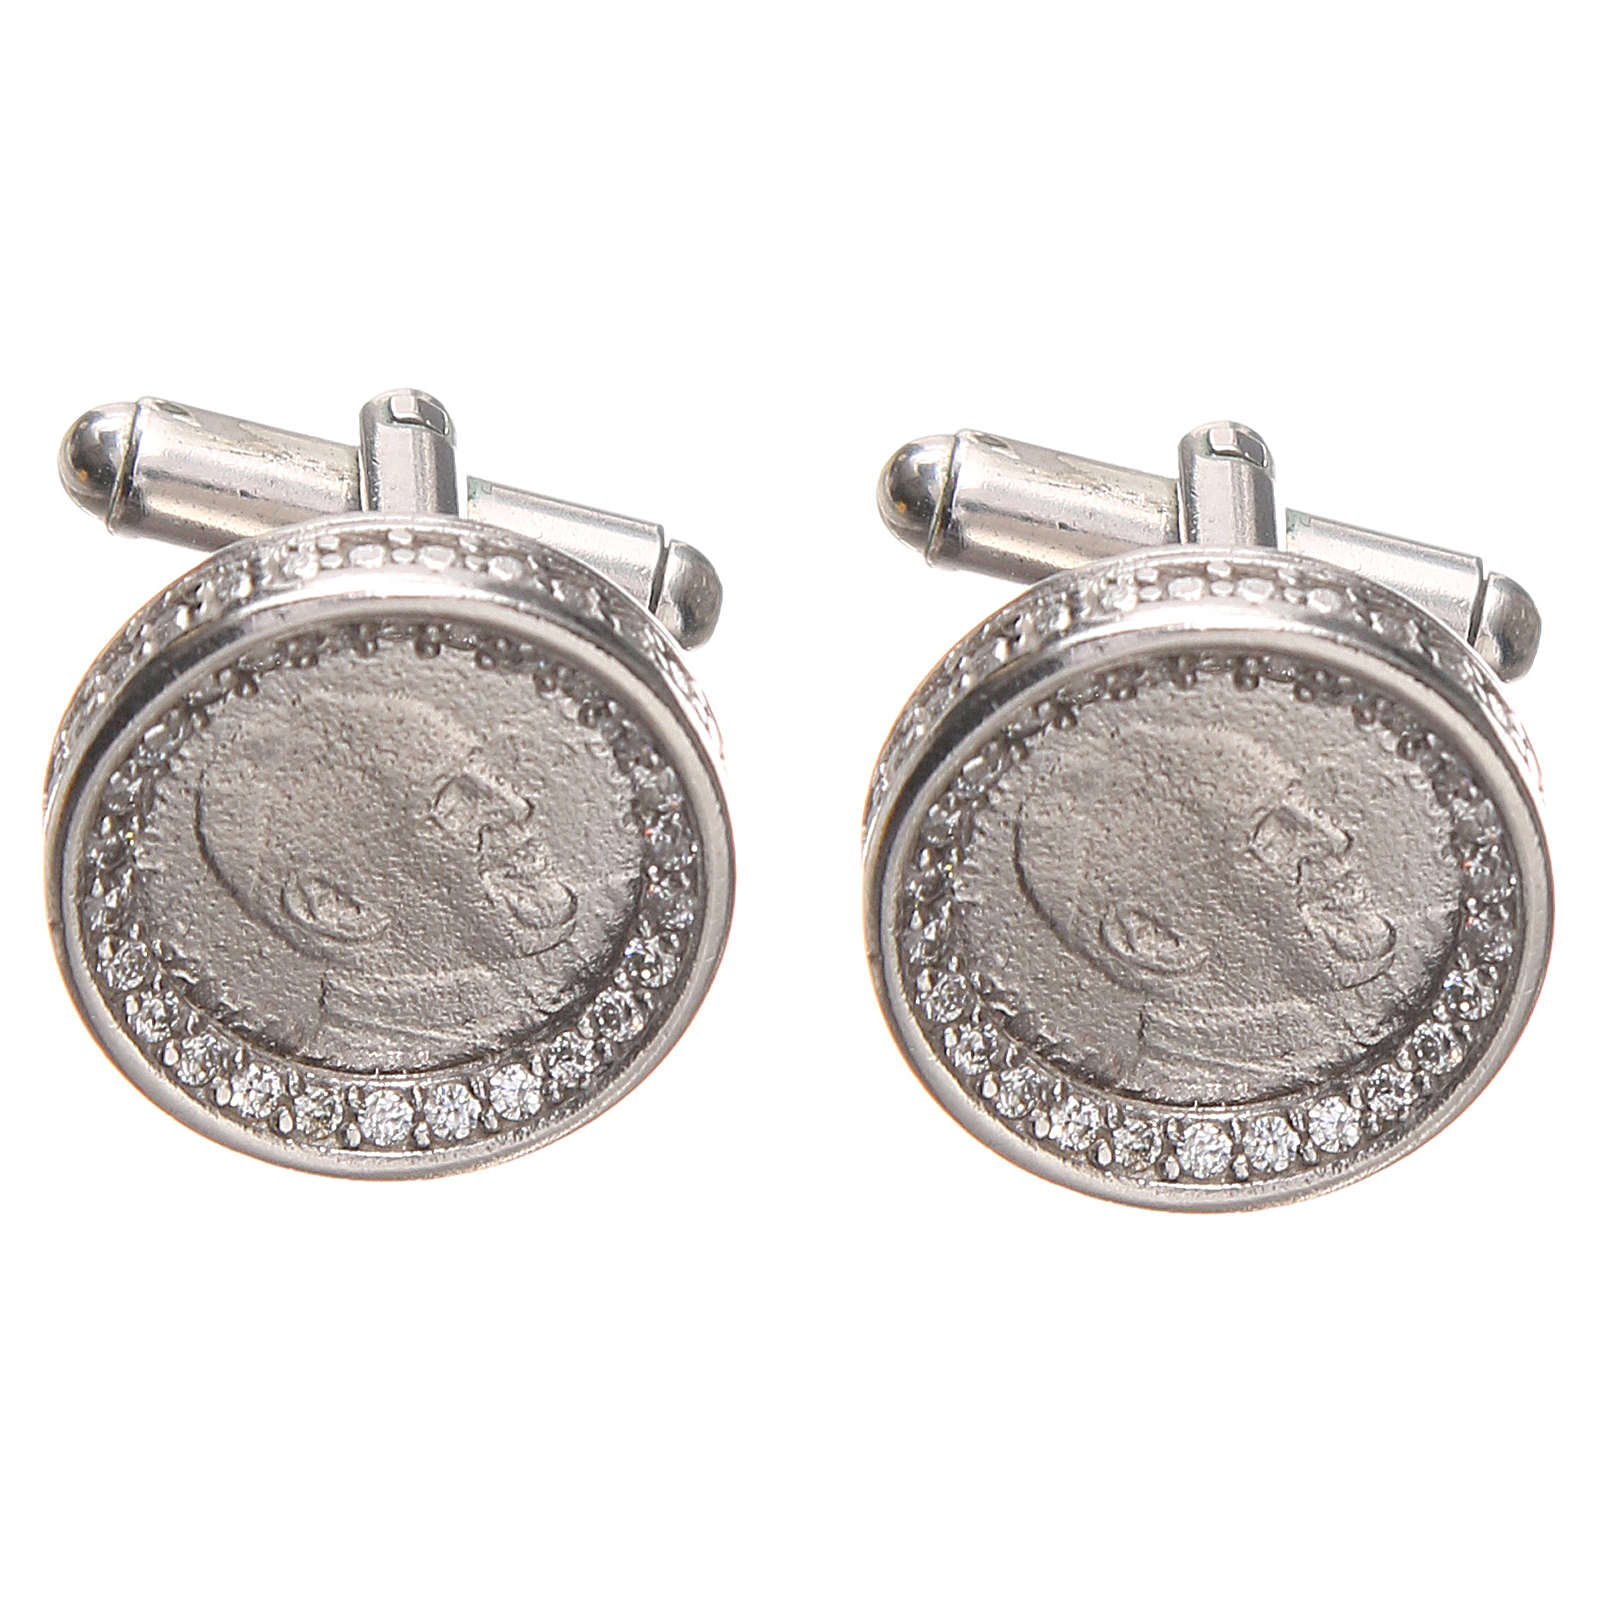 Mancuernillas de pulsera plata 800 Papa Francisco 1,7 cm 4